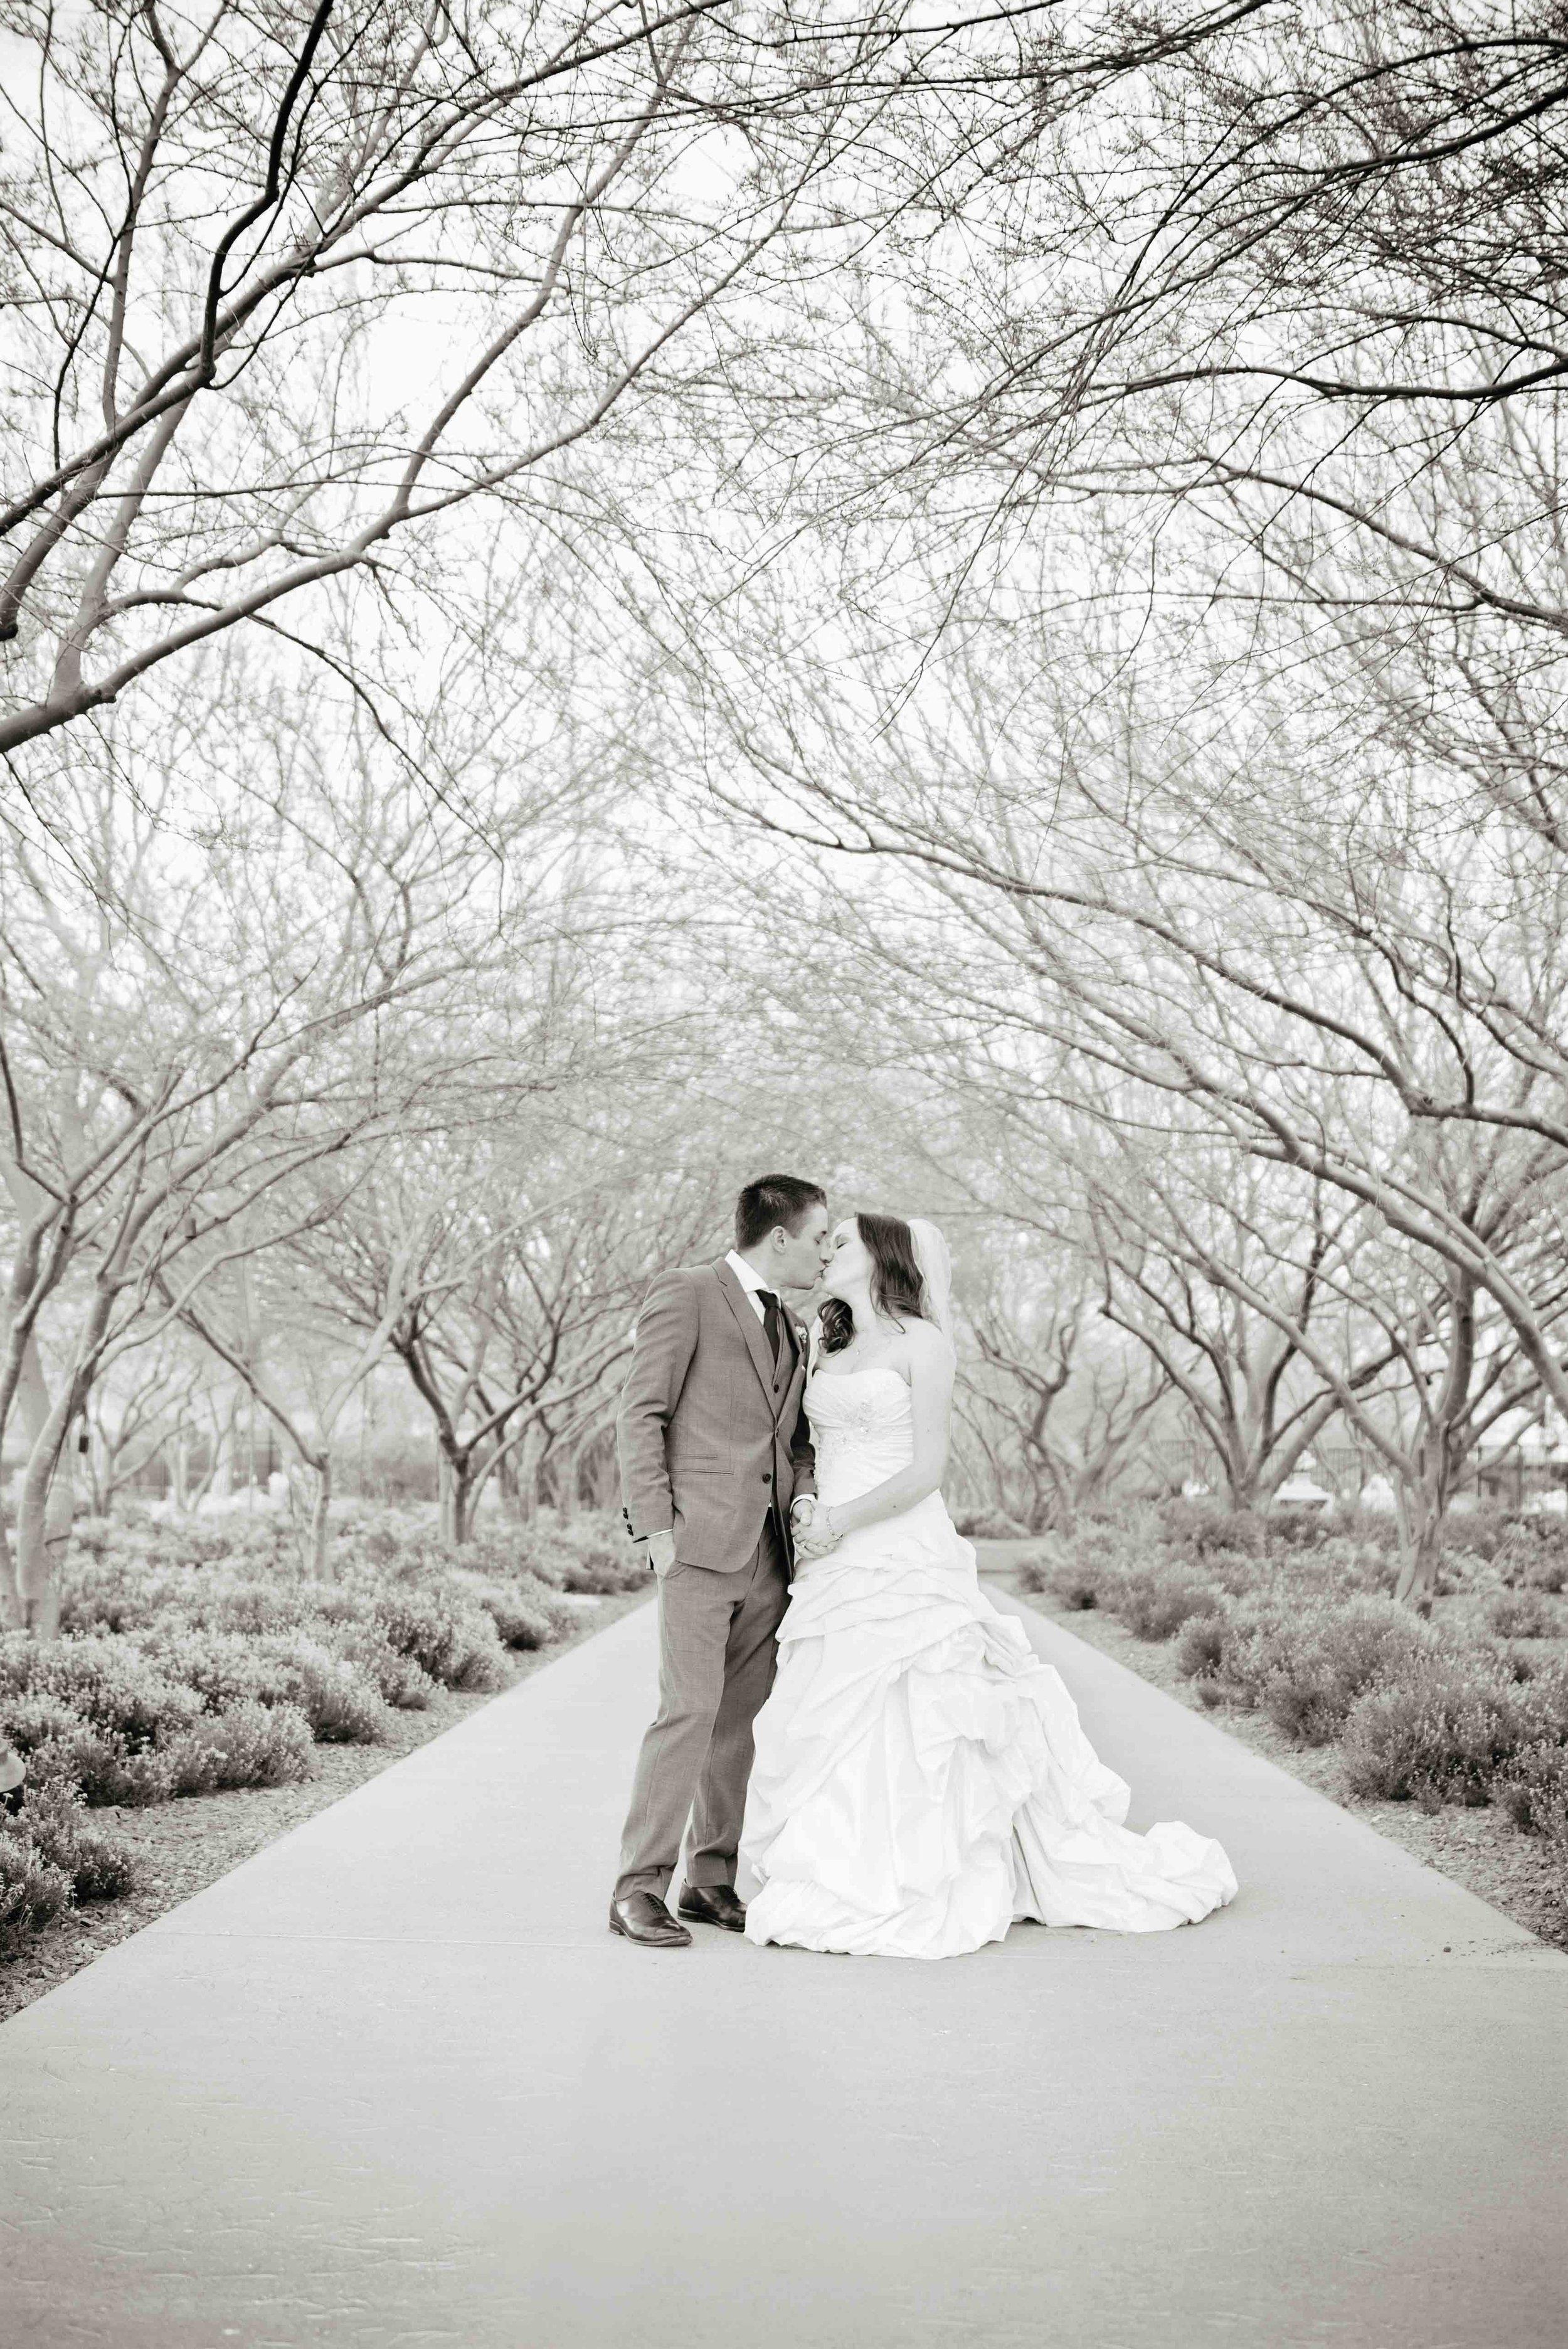 weddingwebsitesmallerpics-133.jpg